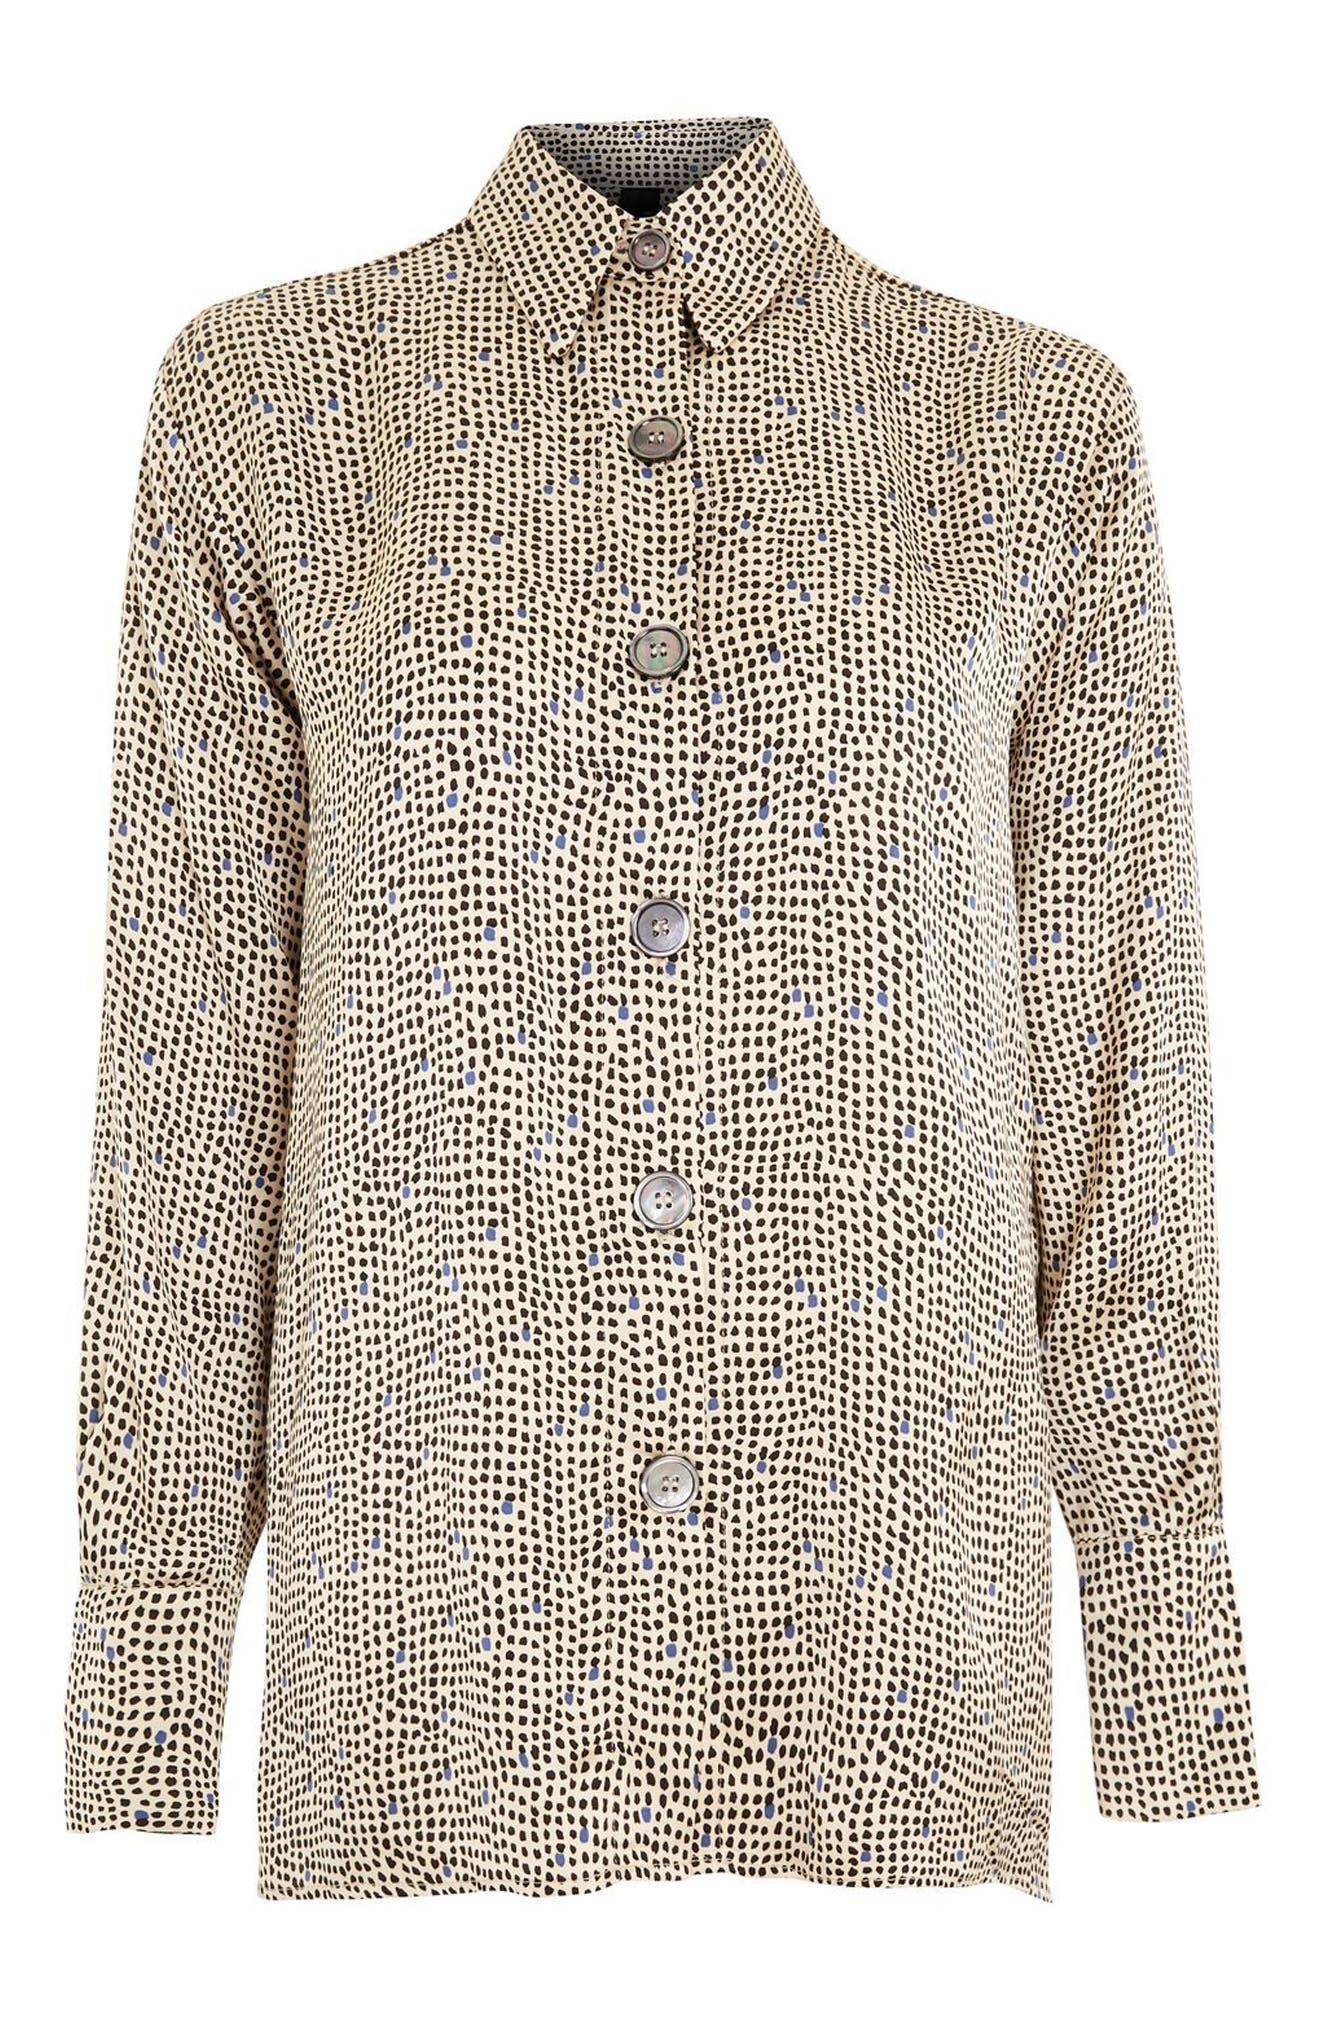 Mini Spot Shirt,                         Main,                         color, Beige Multi